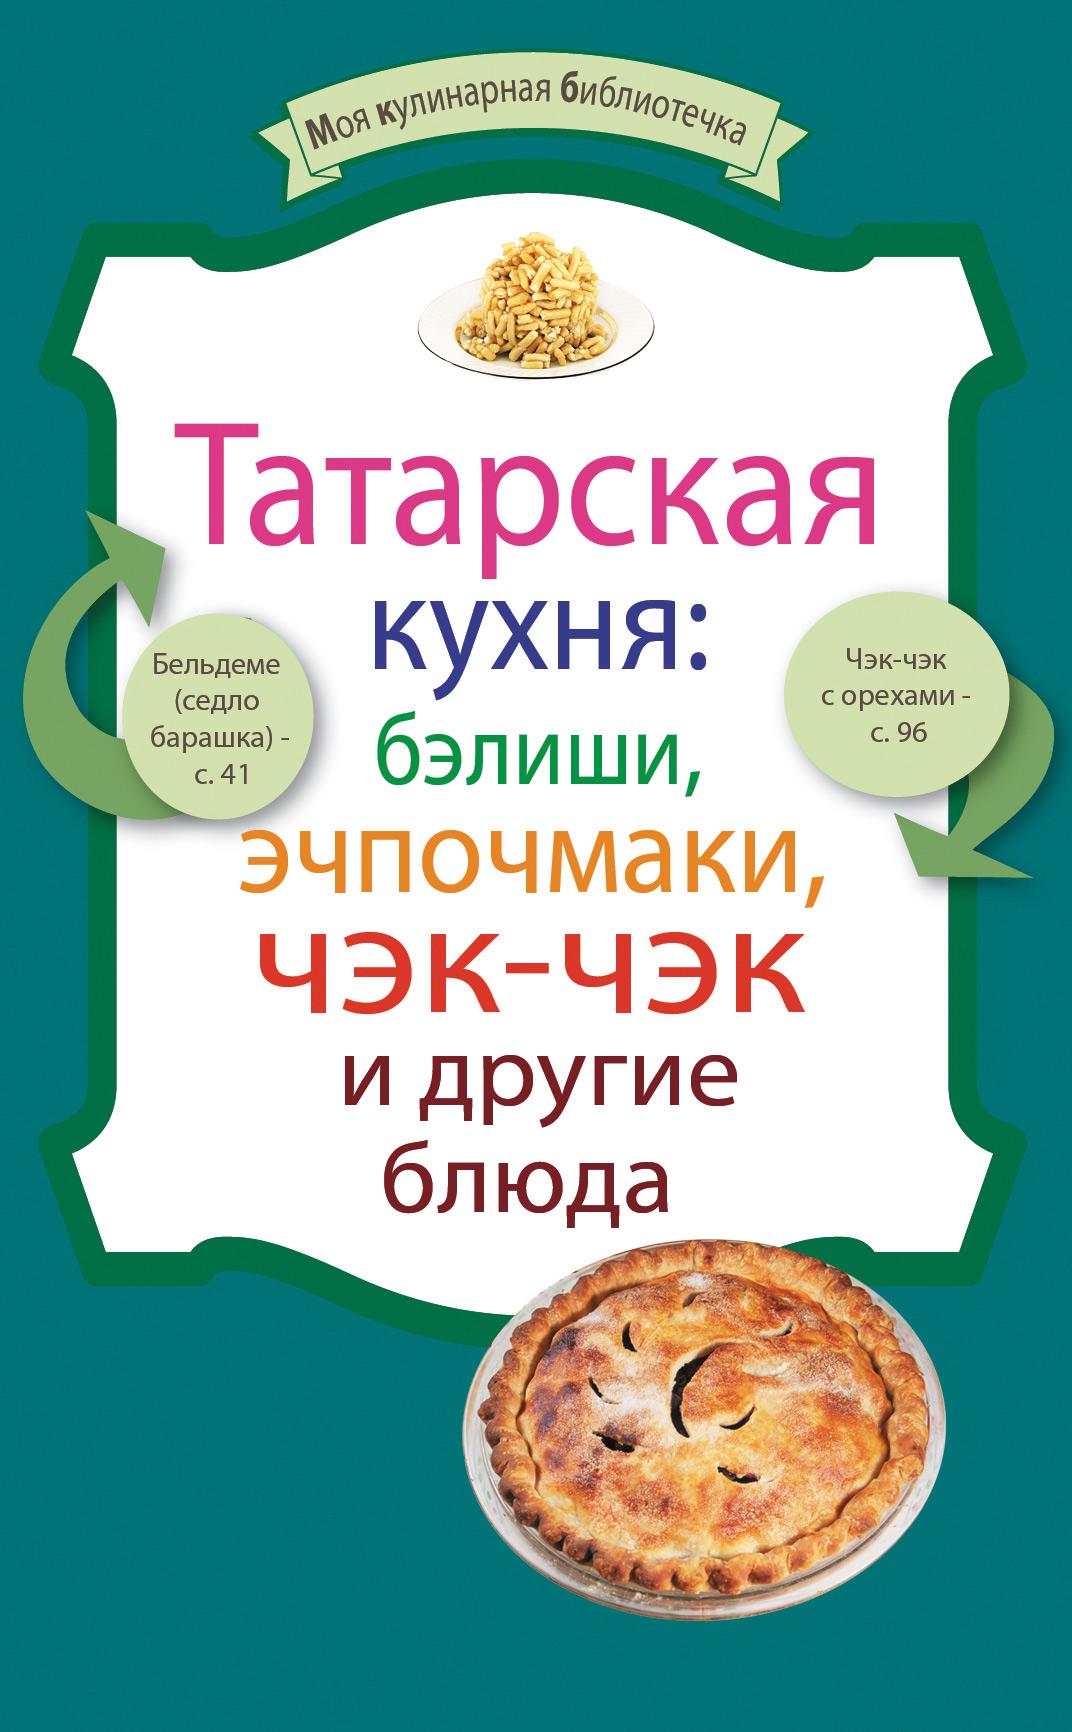 Татарская кухня: бэлиши, эчпочмаки, чэк-чэк и другие блюда